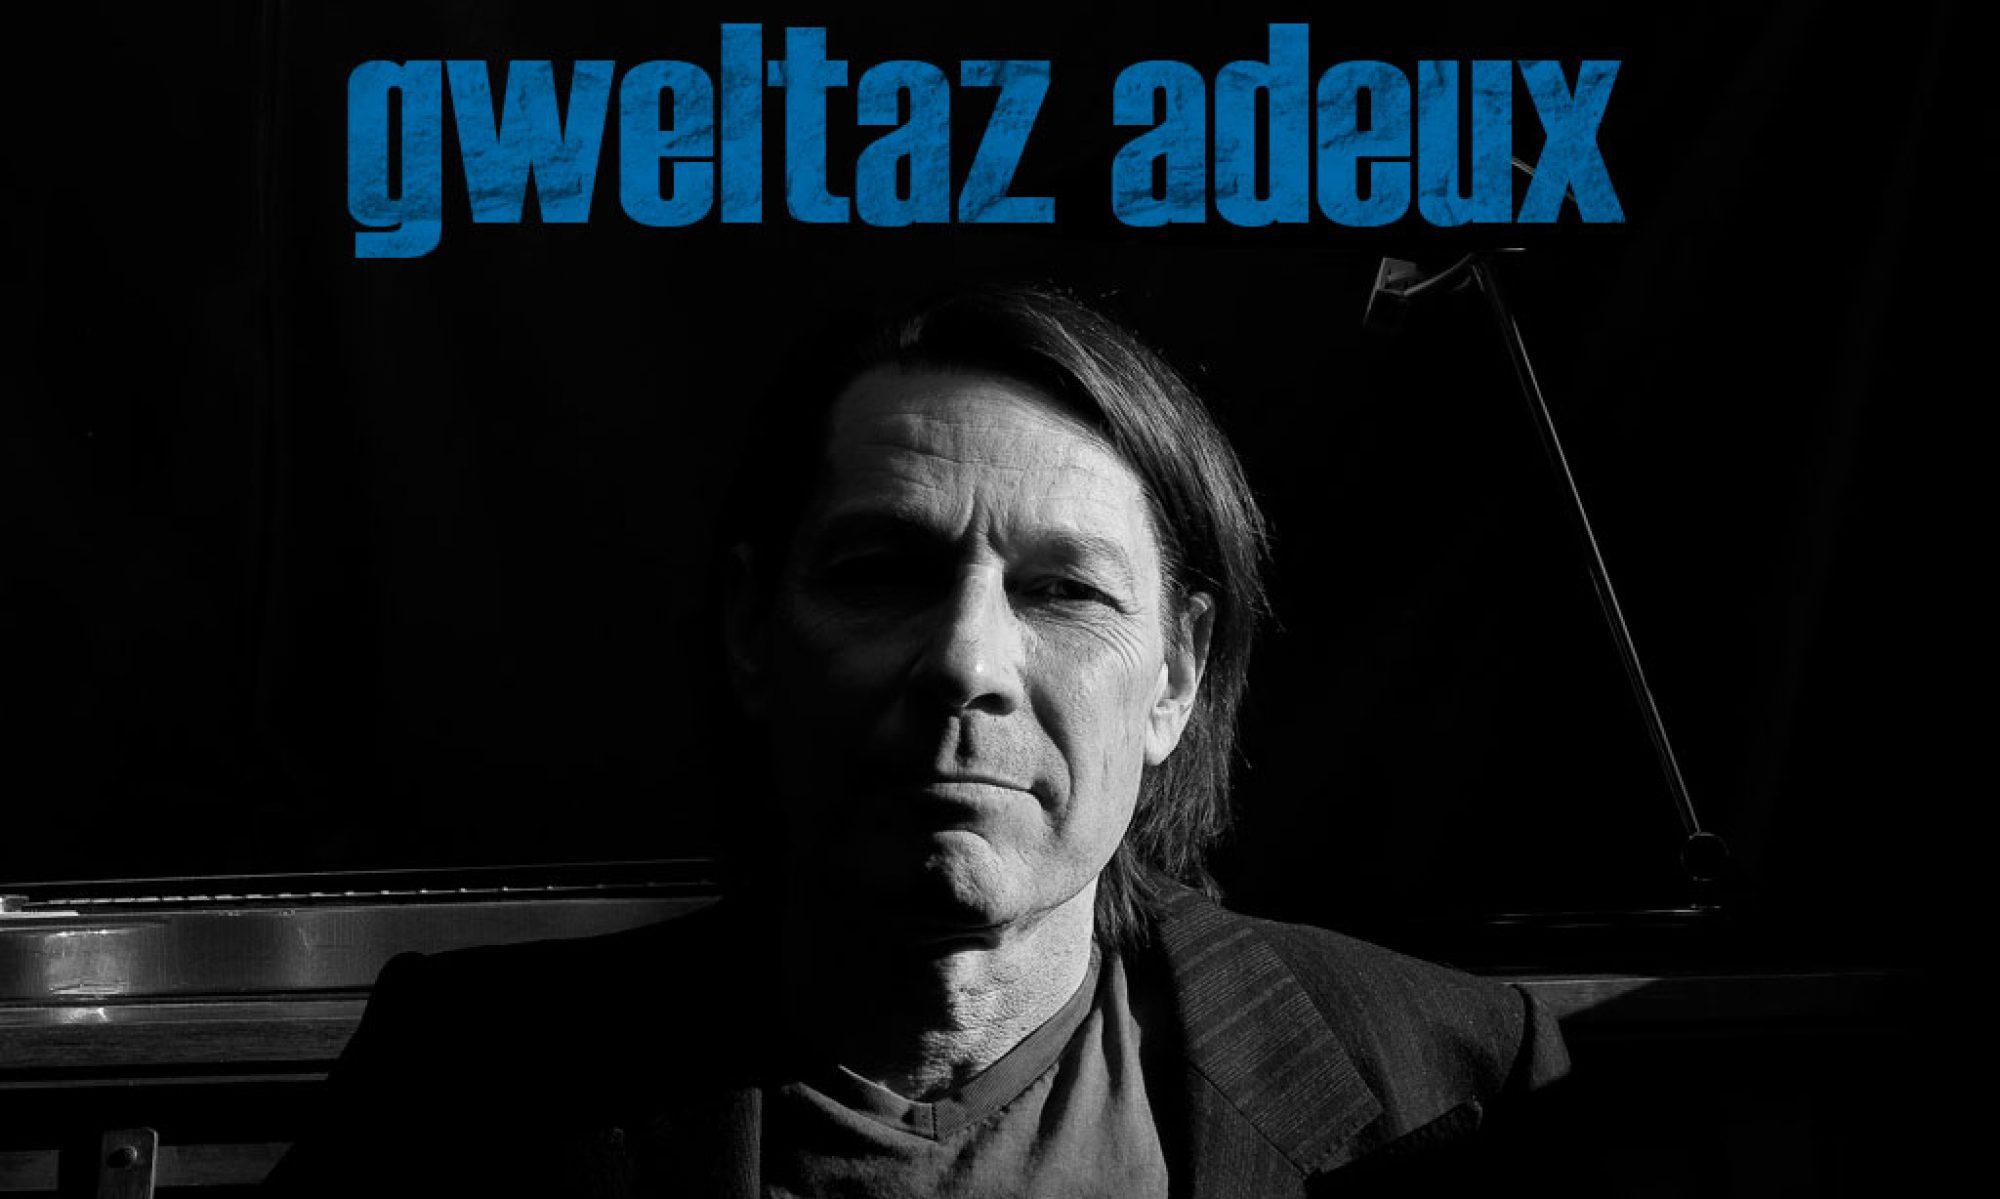 Gweltaz Adeux